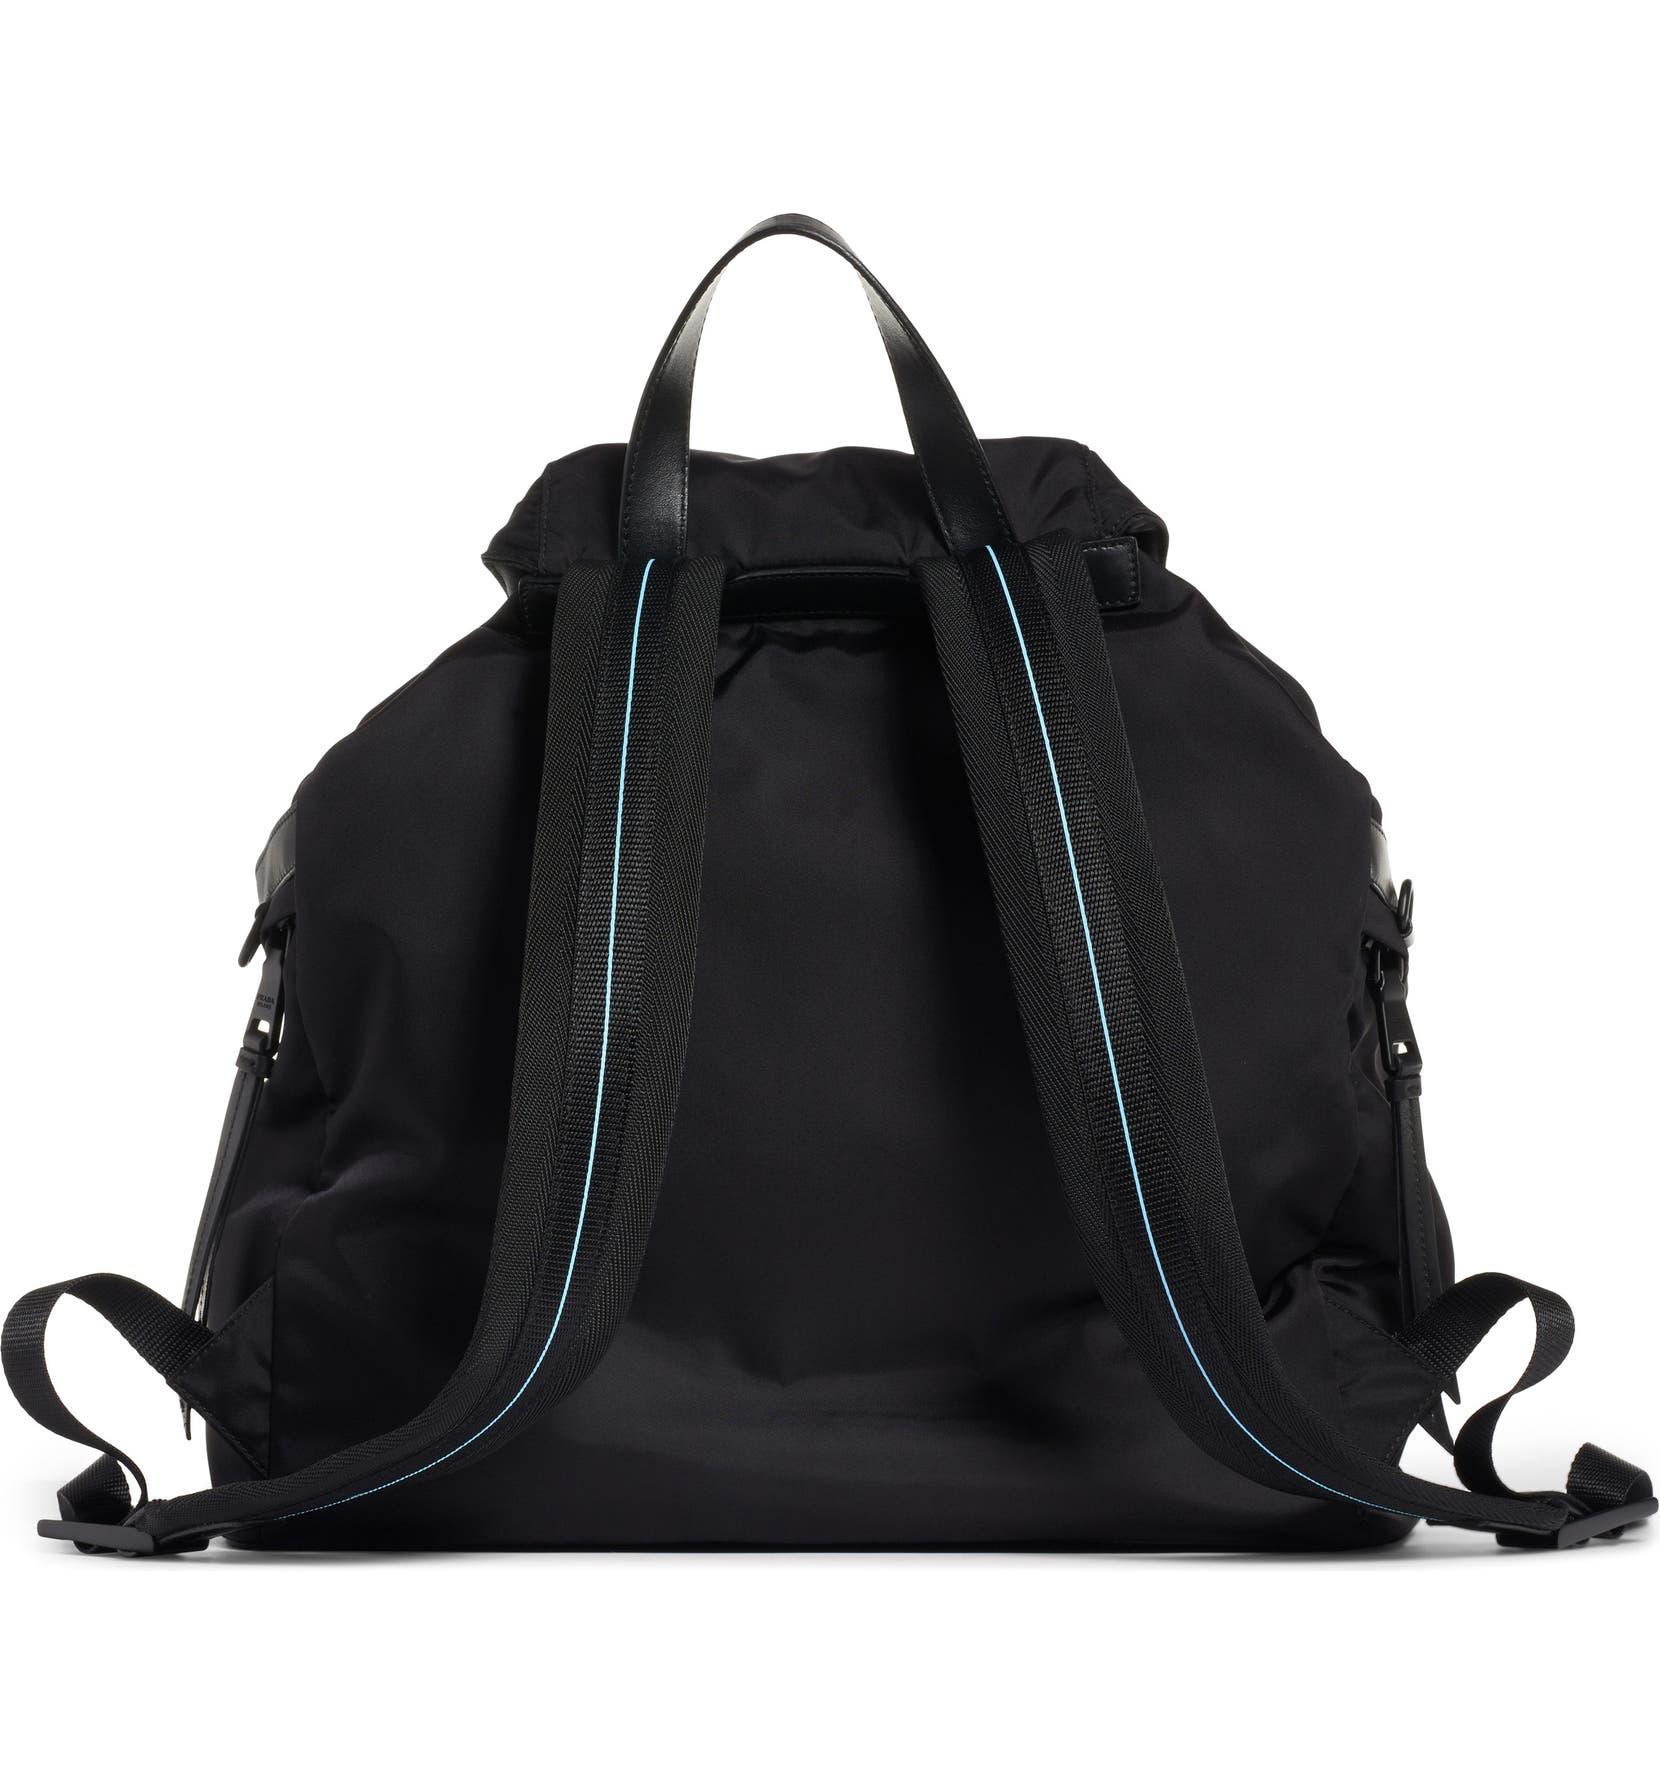 22b6b09de5 Prada Tessuto   Calfskin Leather Backpack